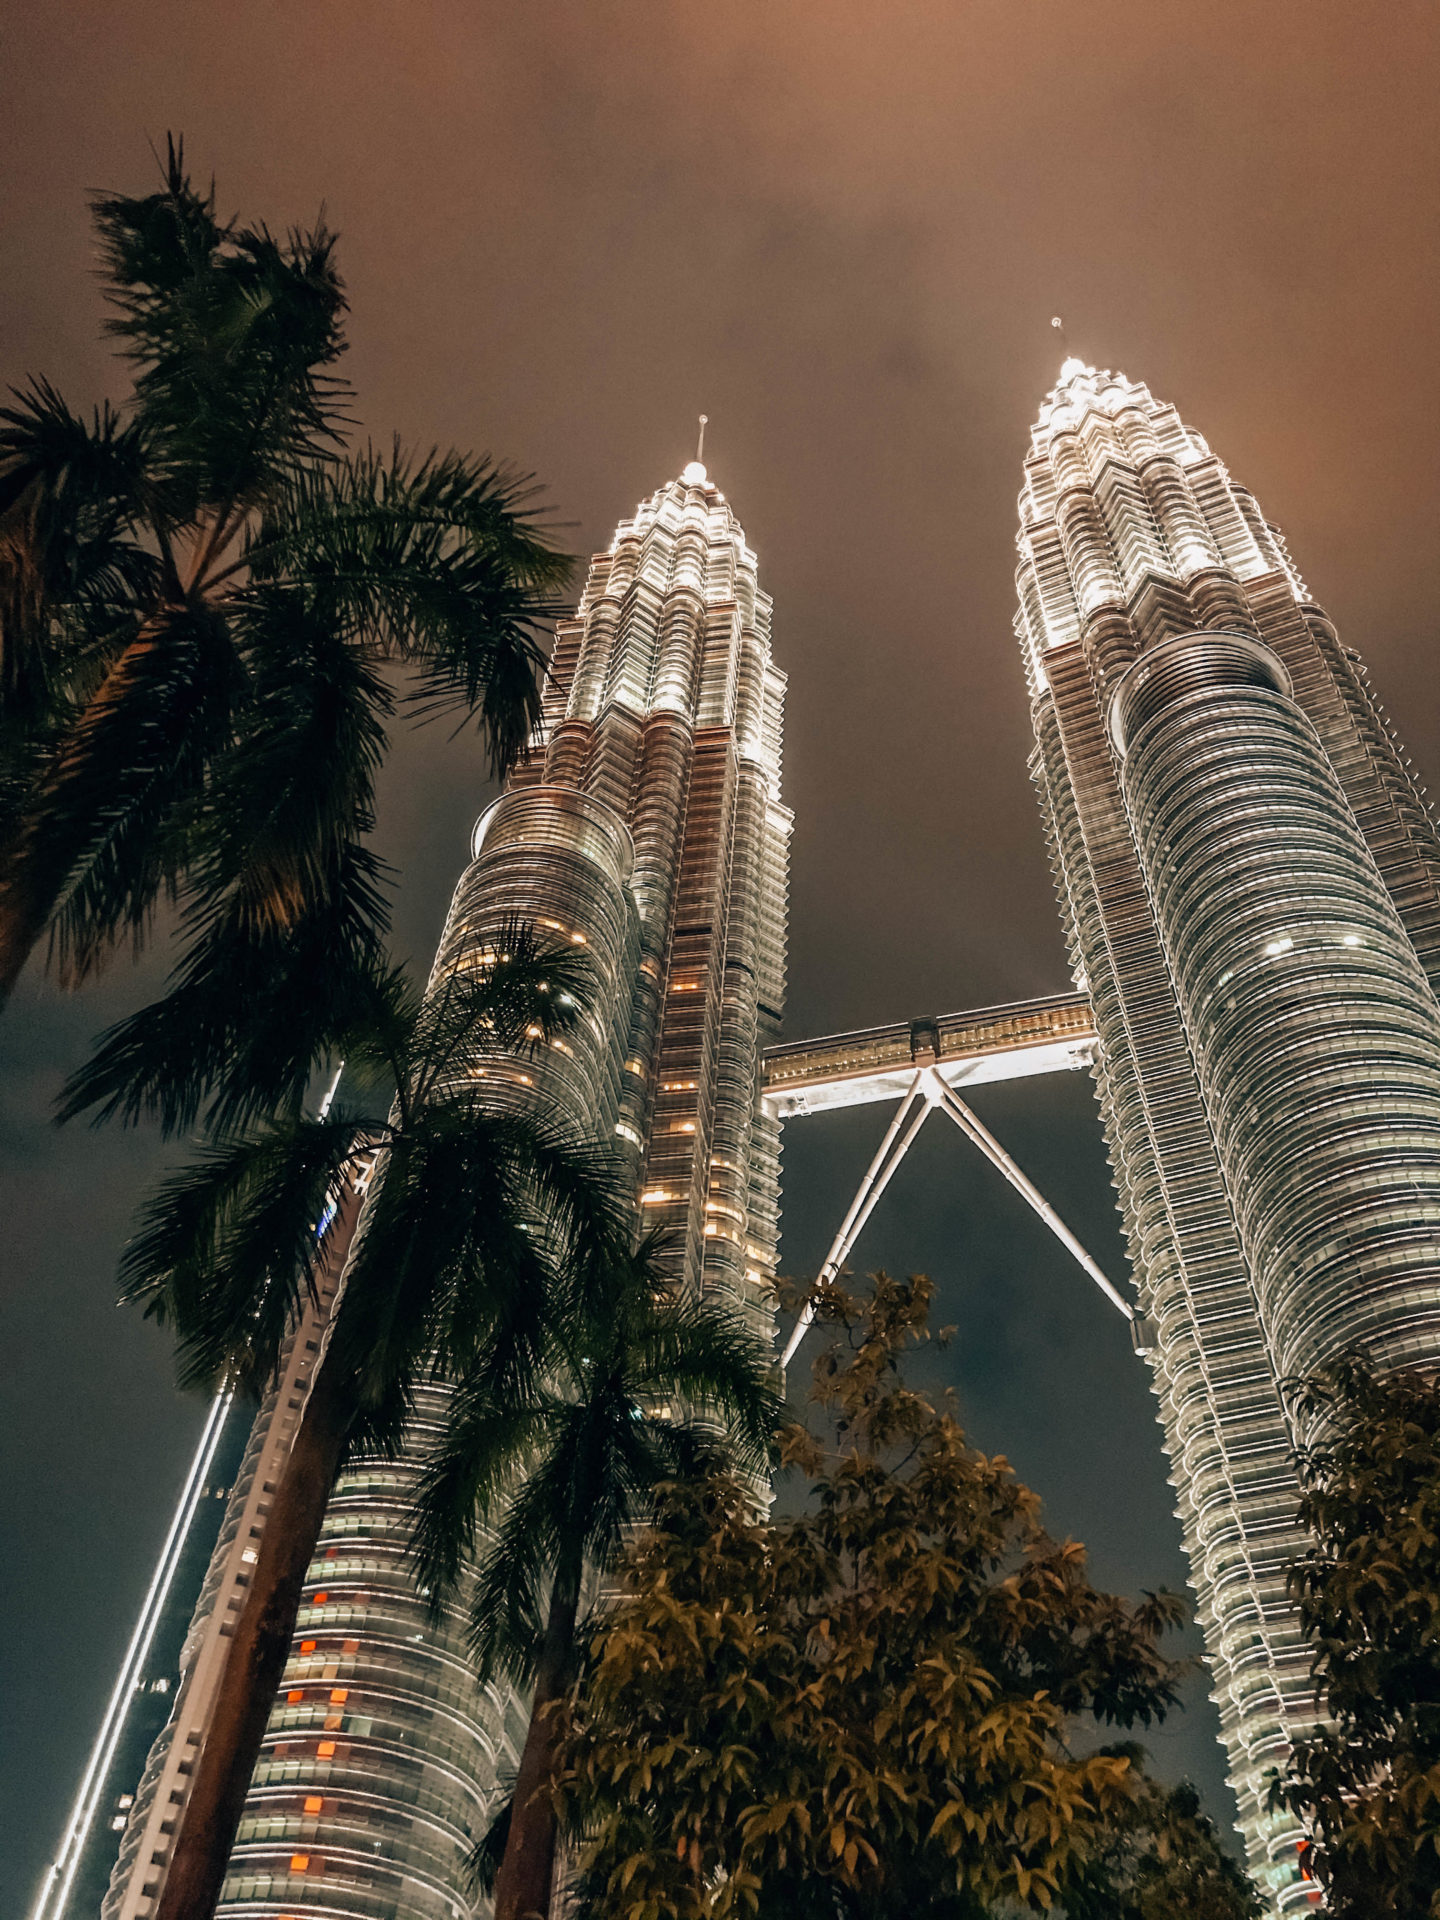 Petronas towers by night in Kuala Lumpur